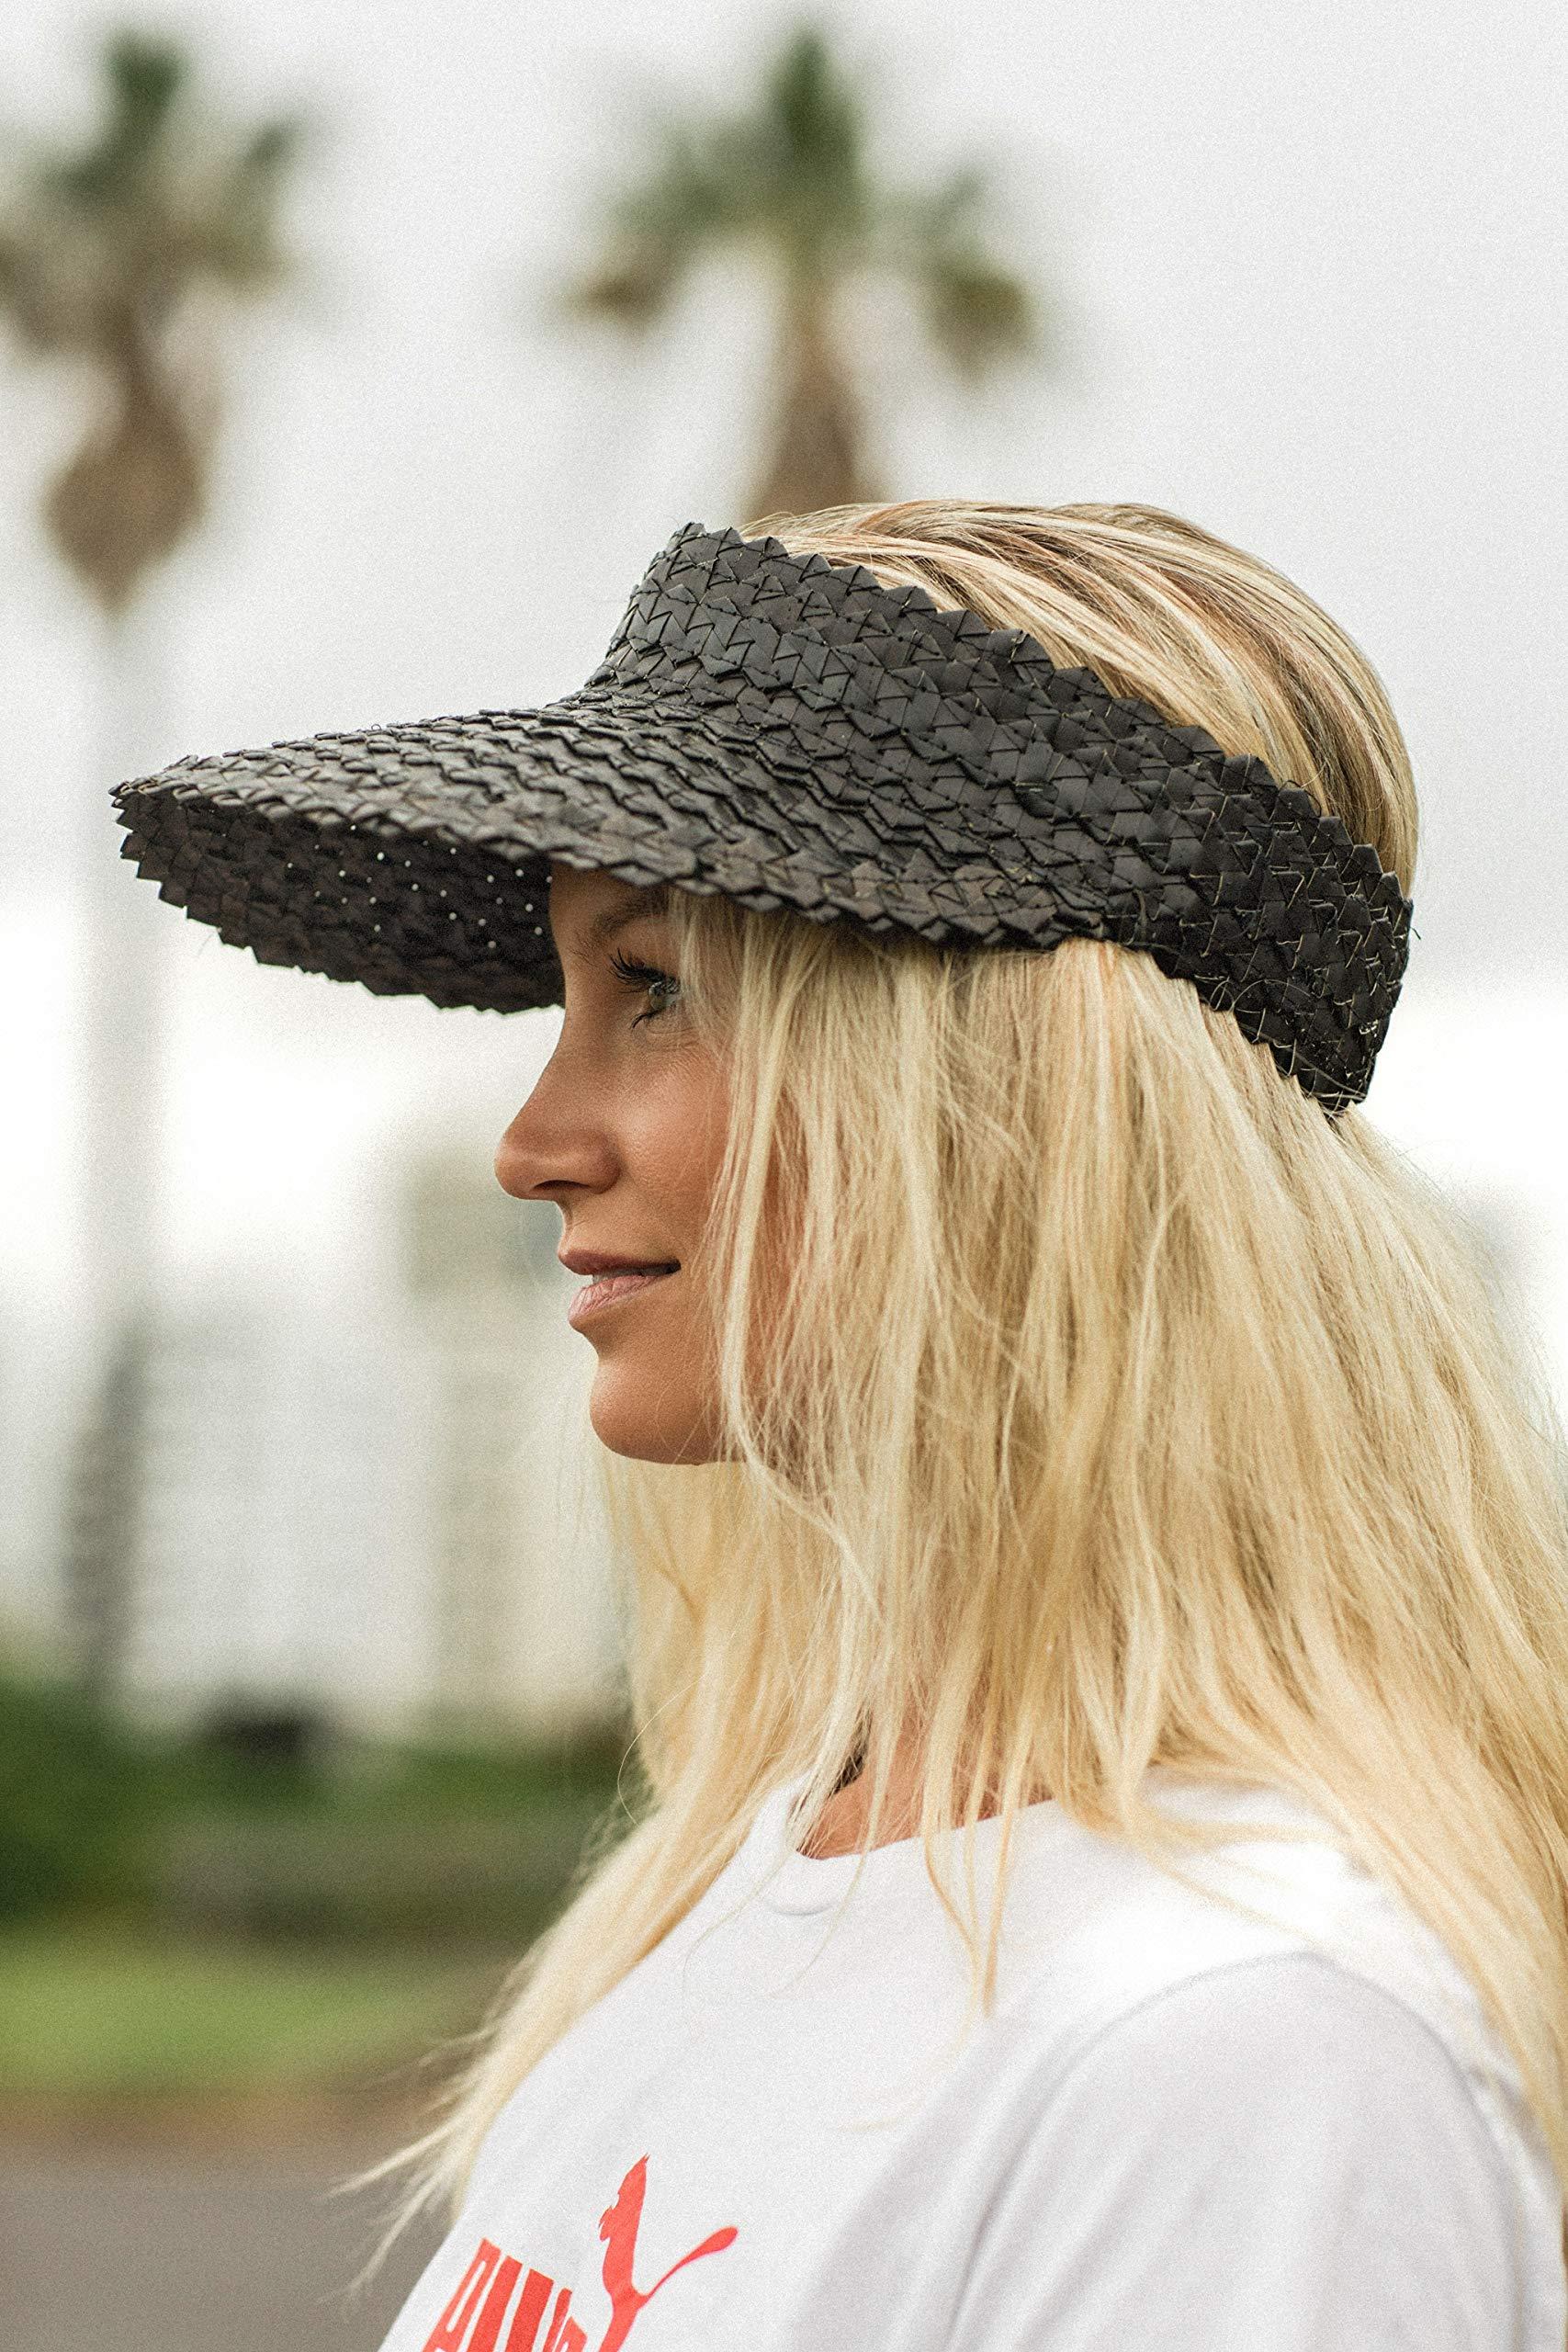 Sun Visor Hat Women Straw Summer Beach Hats Wide Brim Outdoor Camping Hiking